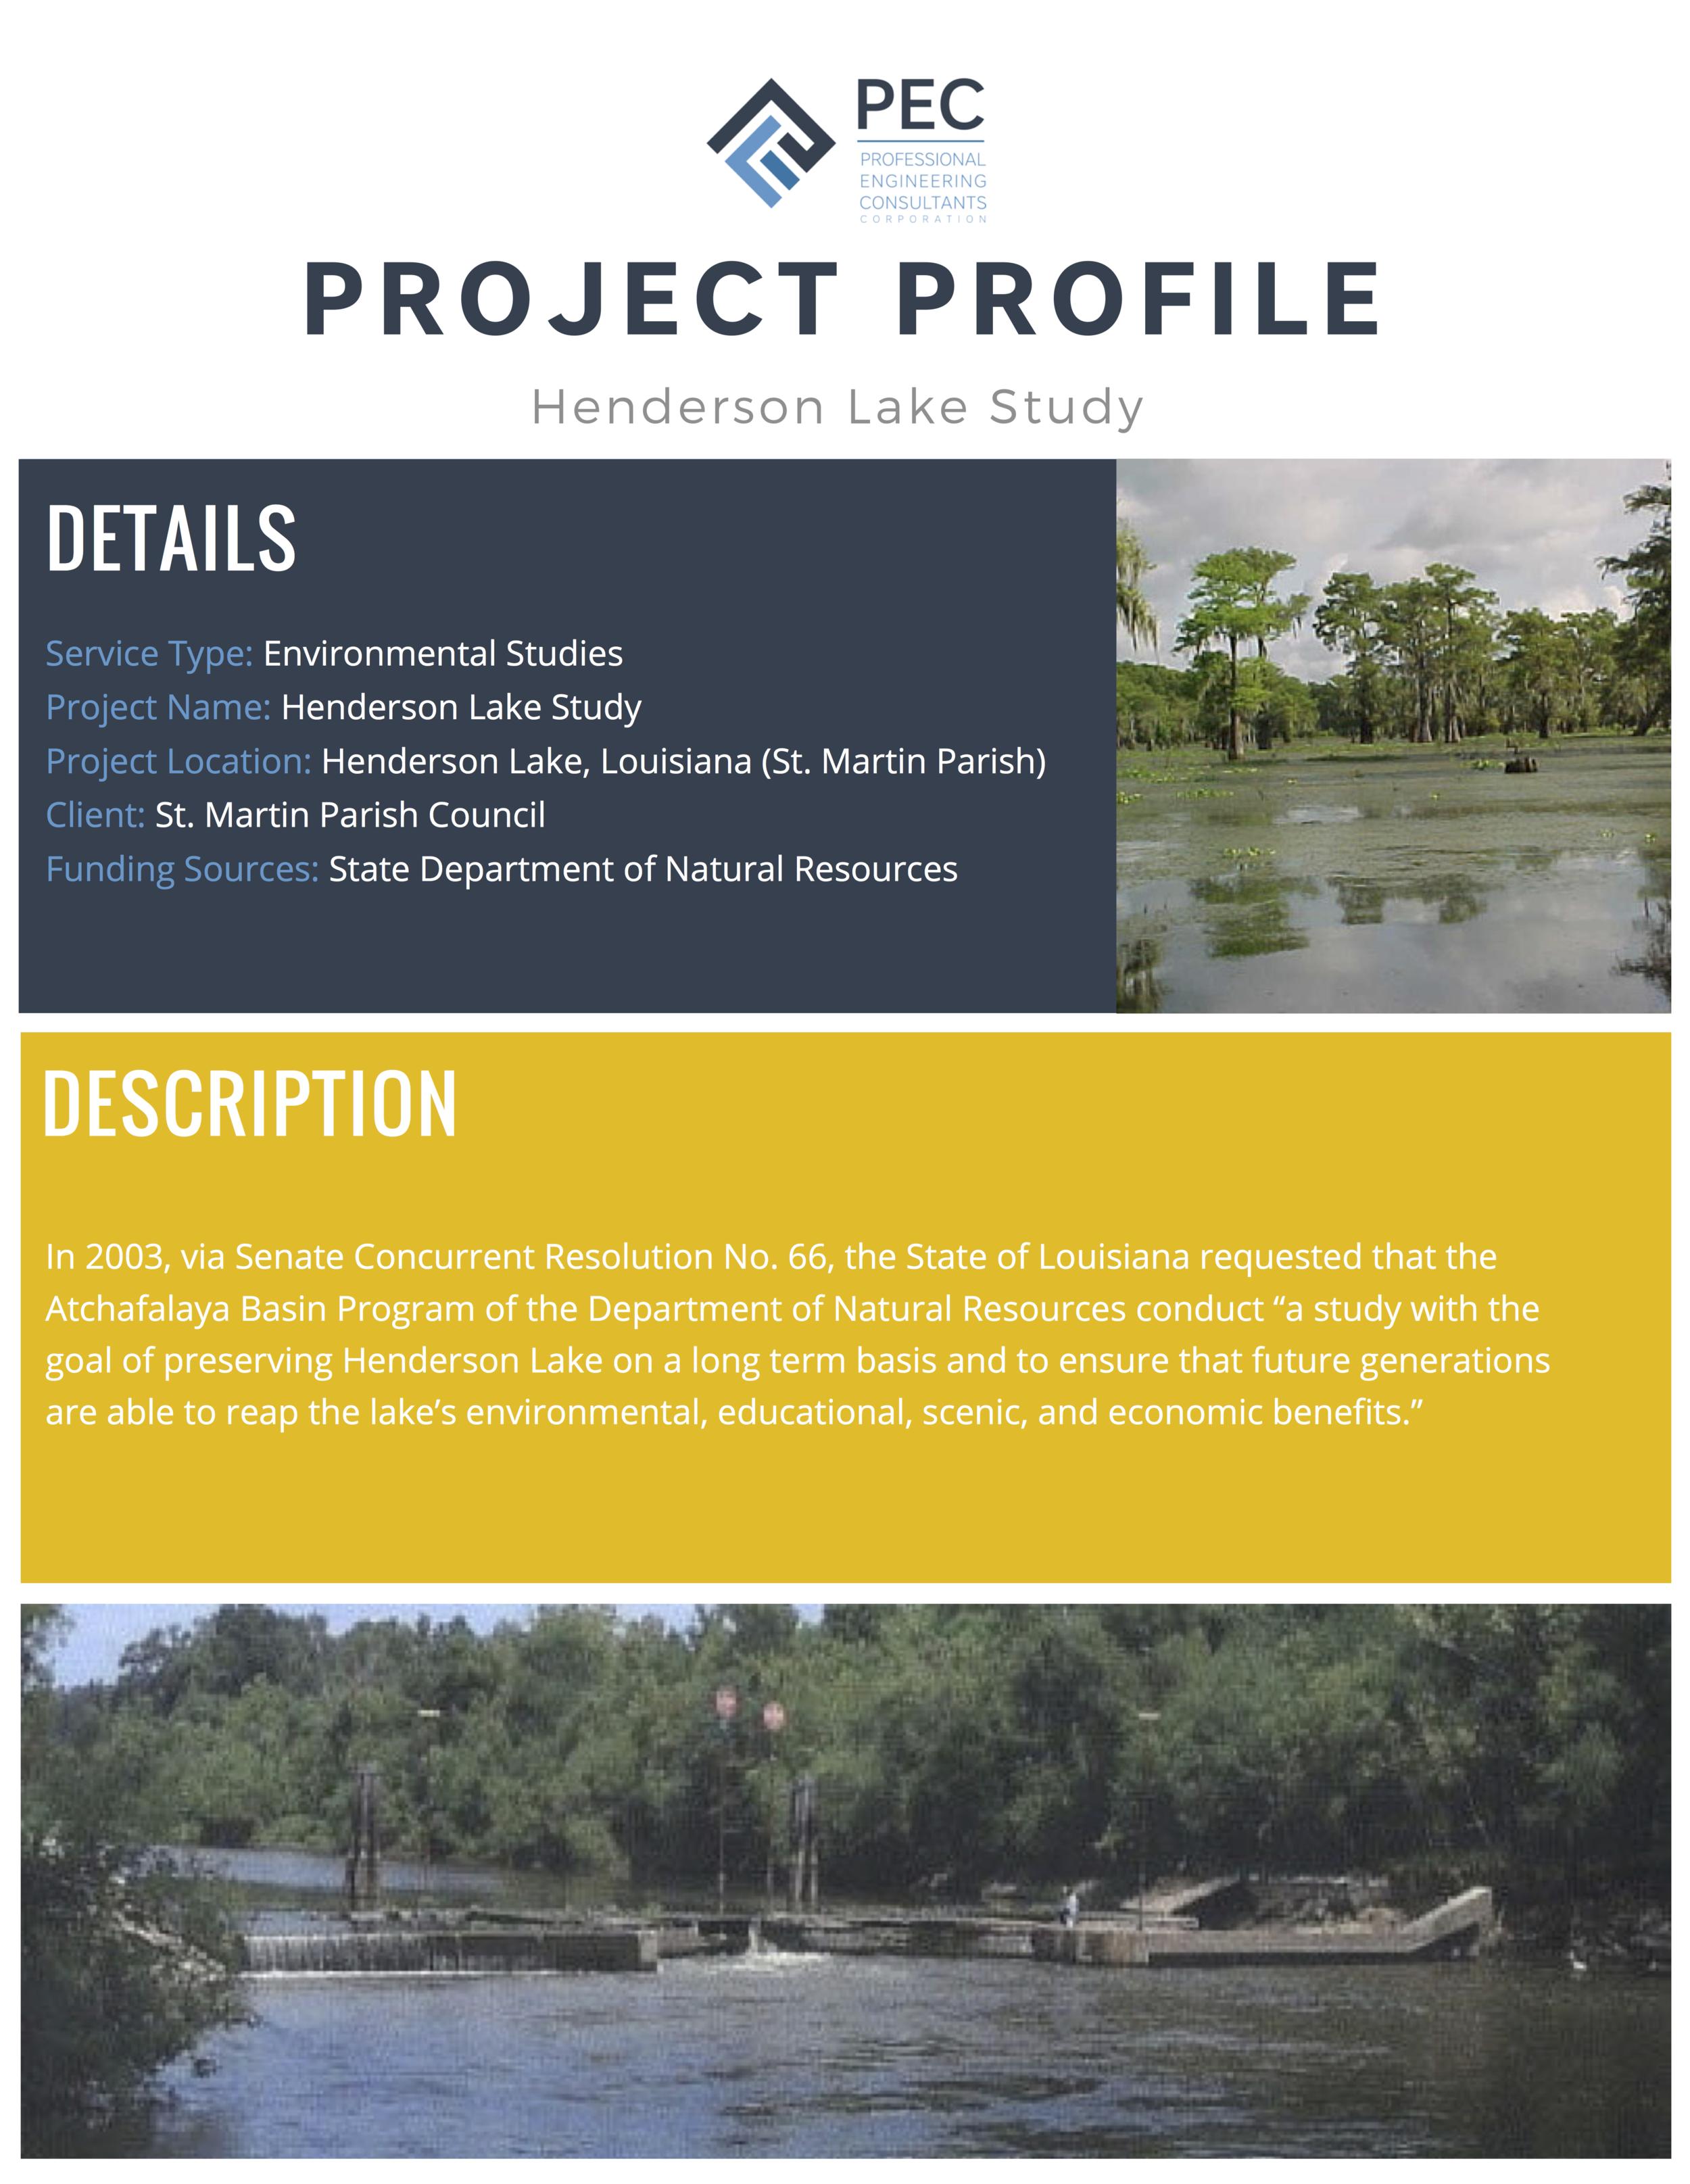 Project Profile_Henderson Lake Study.jpg